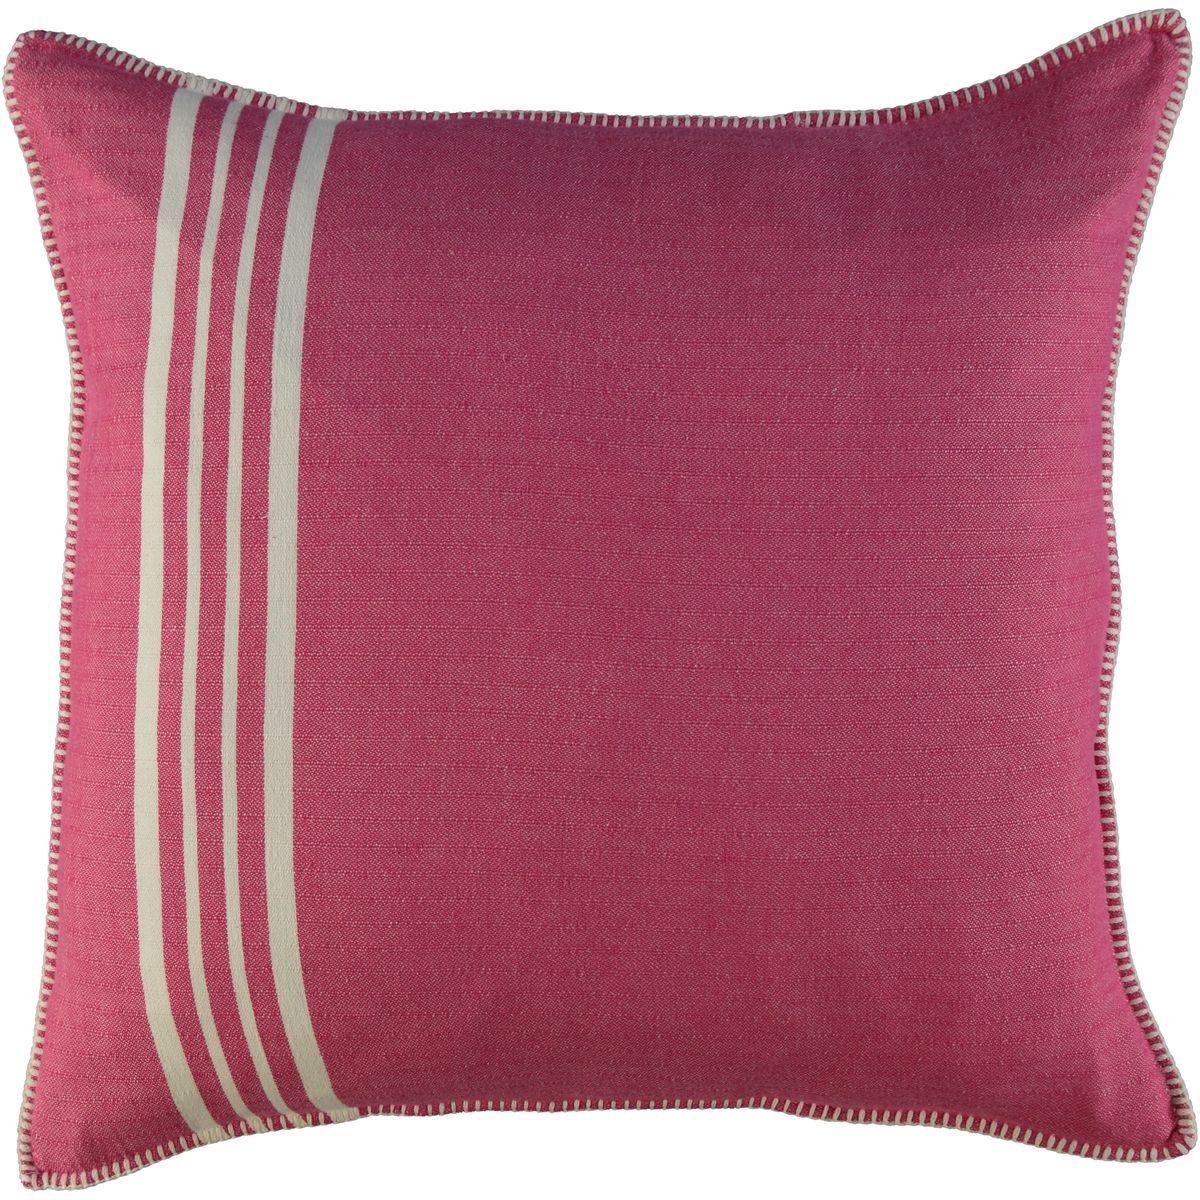 Cushion Cover Sultan - Fucshia / 65x65